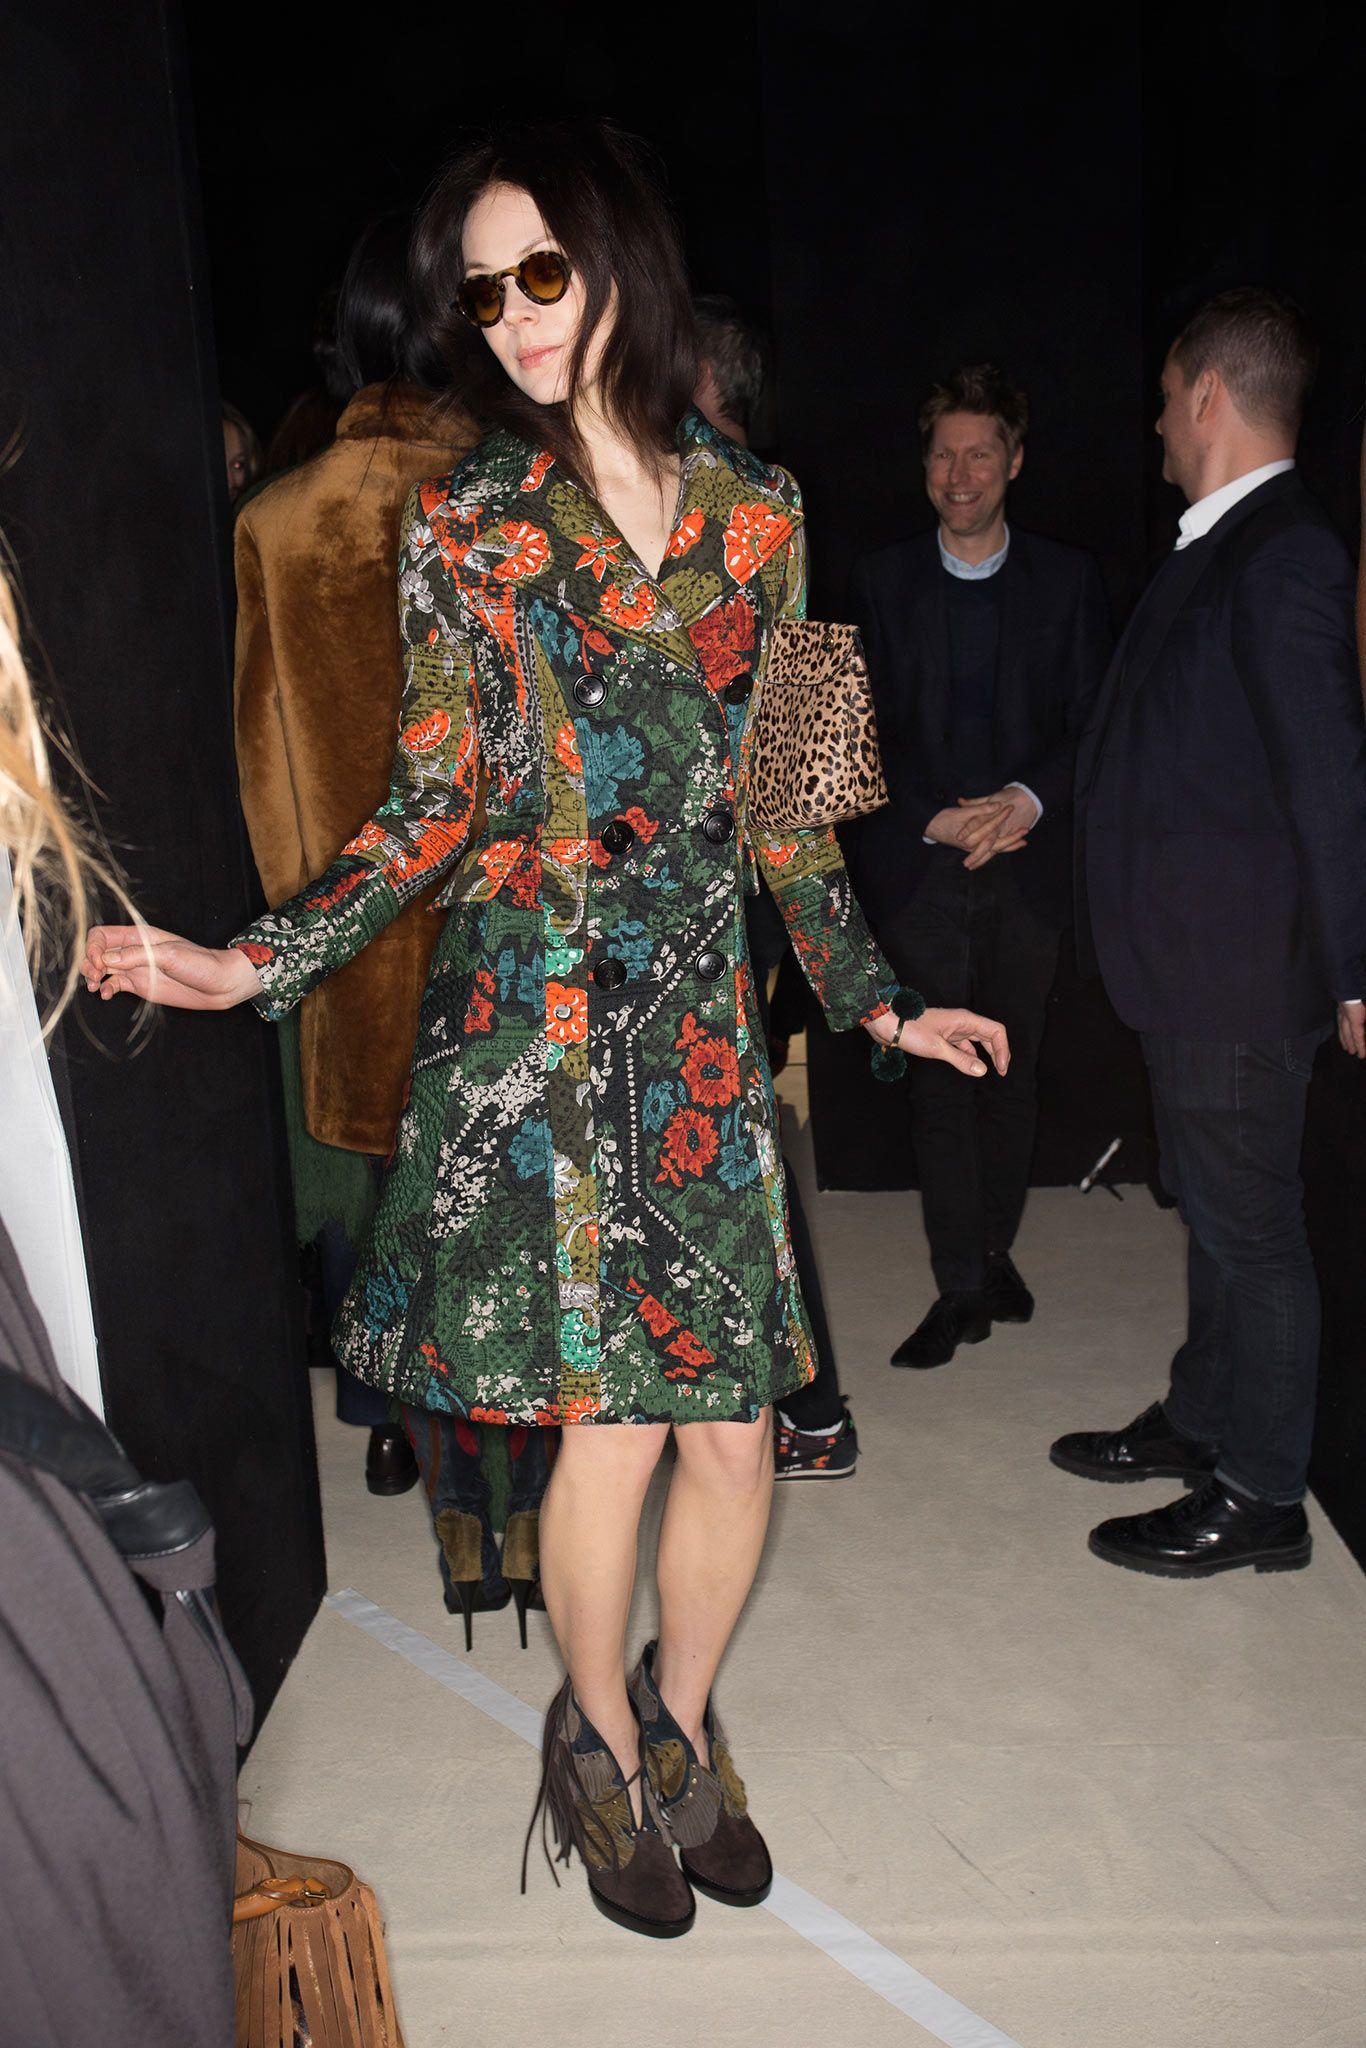 http://media.style.com/image/fashion-shows/fall-2015-ready-to-wear/london/burberry-prorsum/beauty/1366/2048/USA_1803.jpg